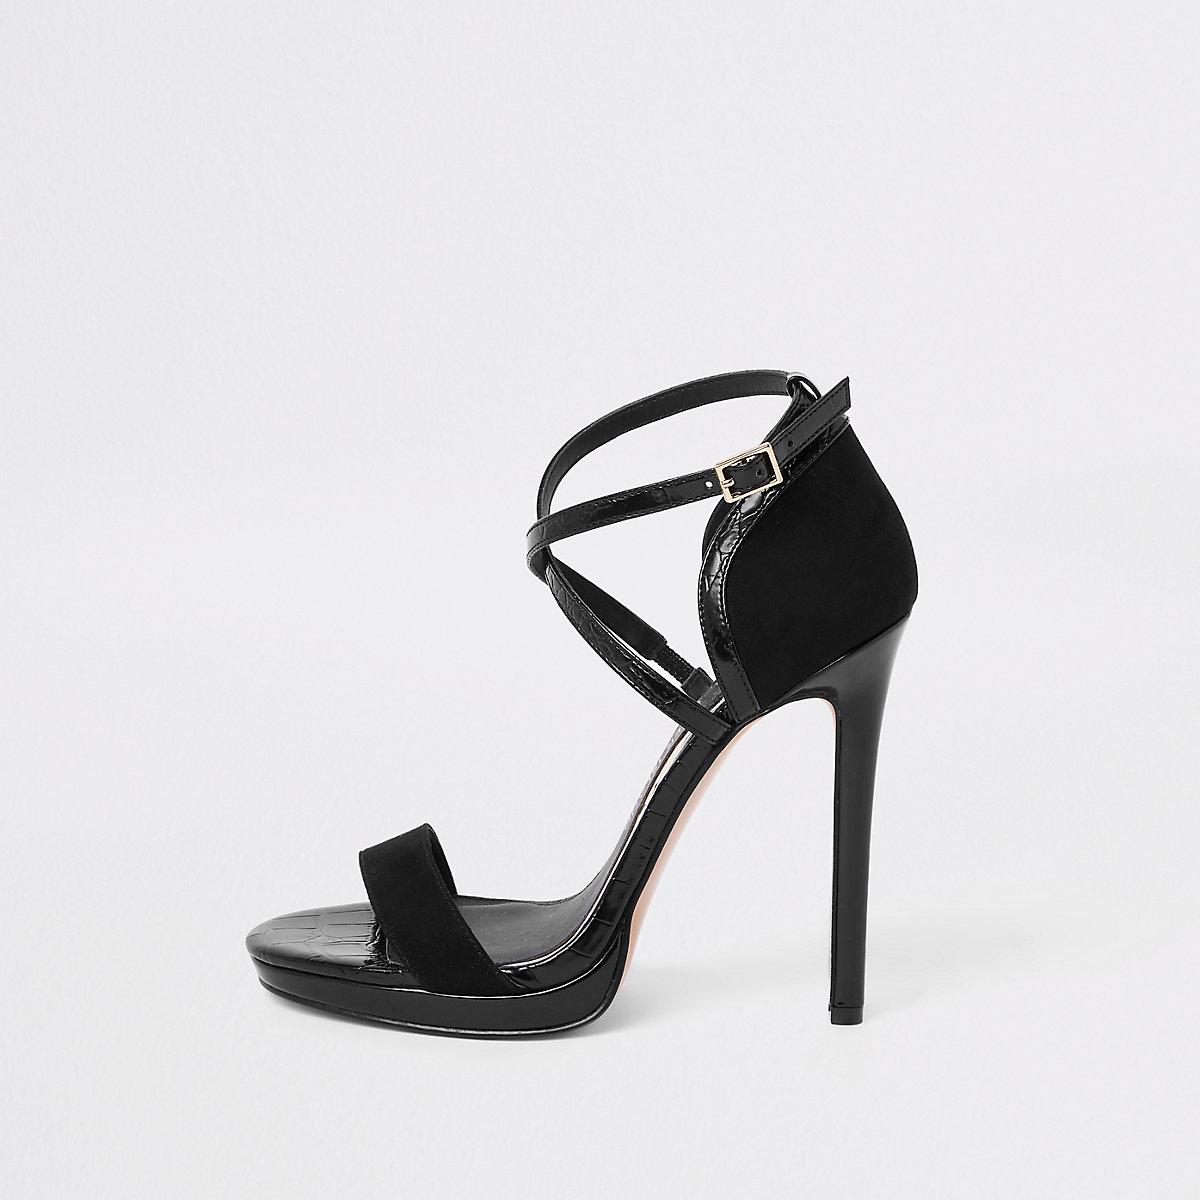 Black wide fit barely there platform sandals